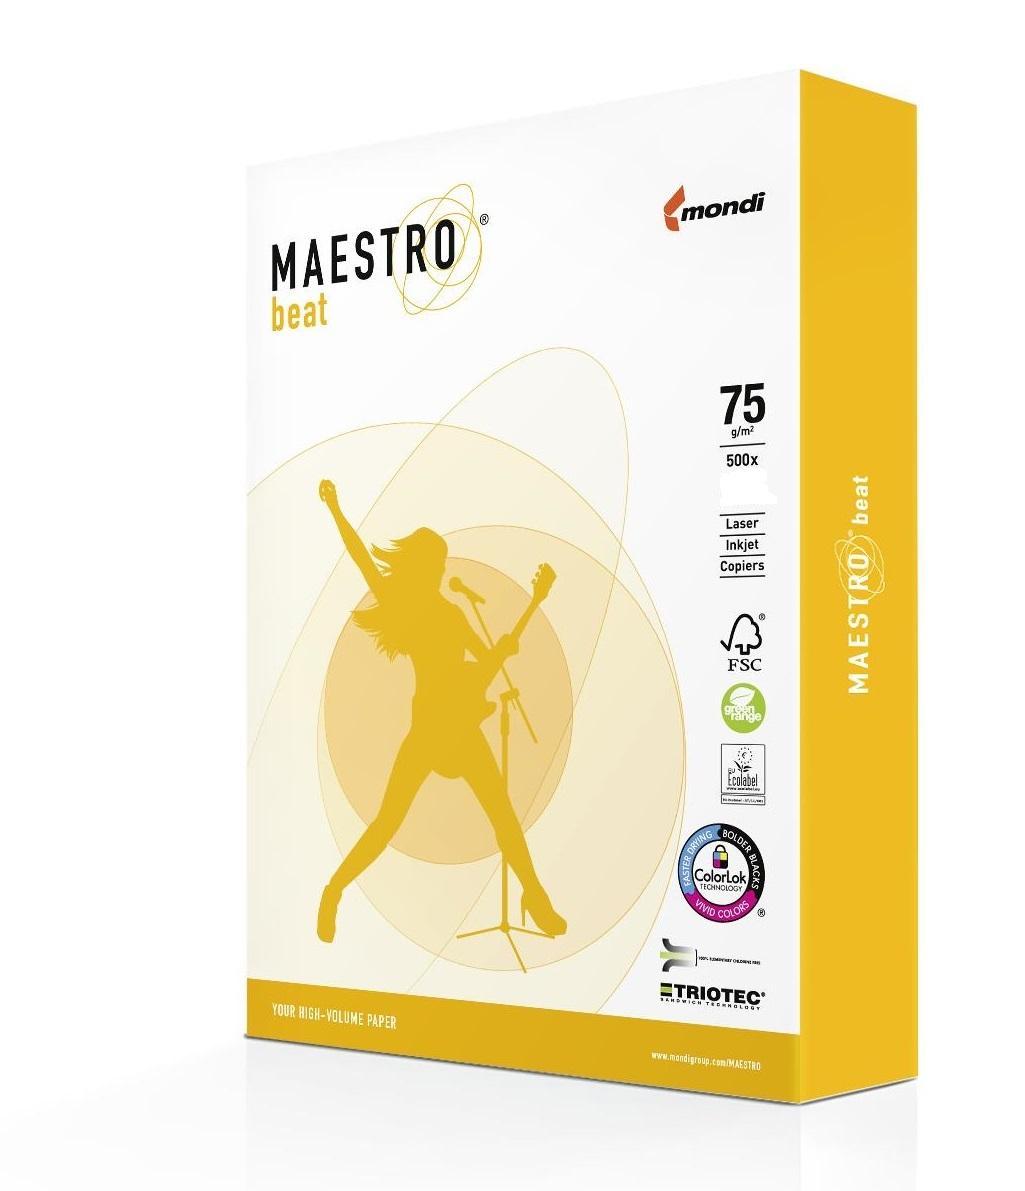 Maestro beat 75g/m² DIN-A3 - 500 Blatt weiß